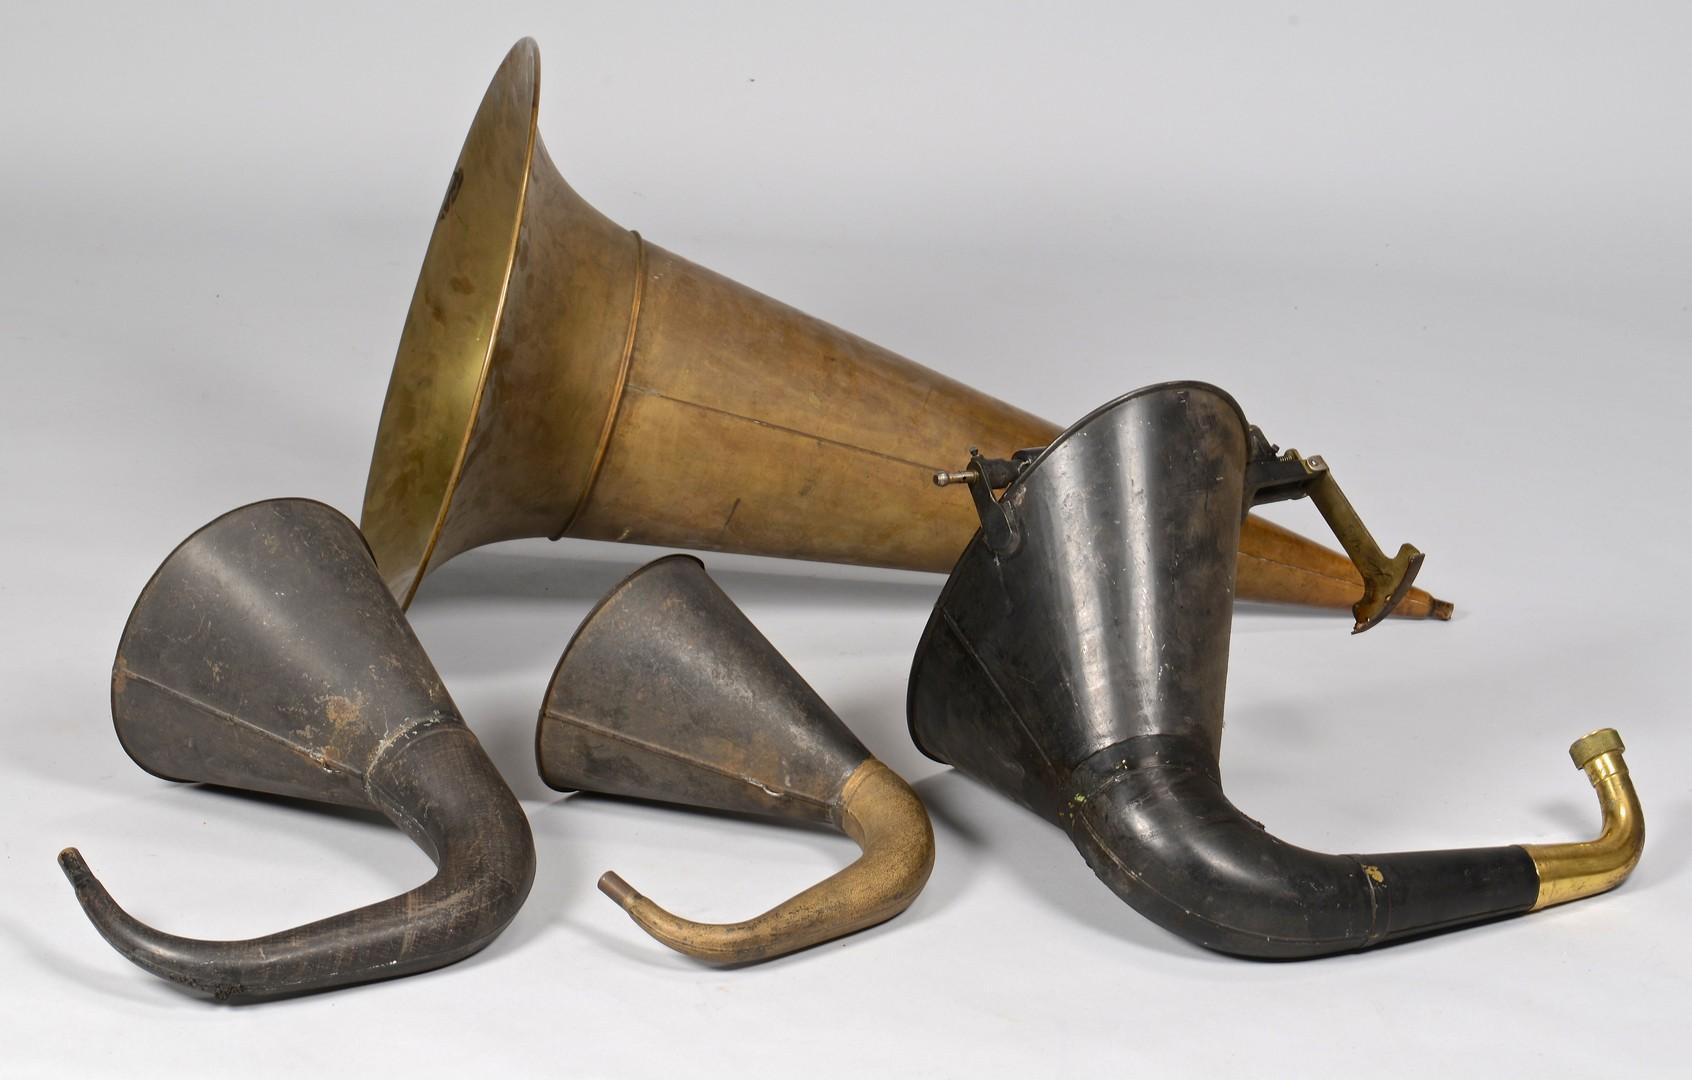 Lot 845: 4 Phonograph Horns